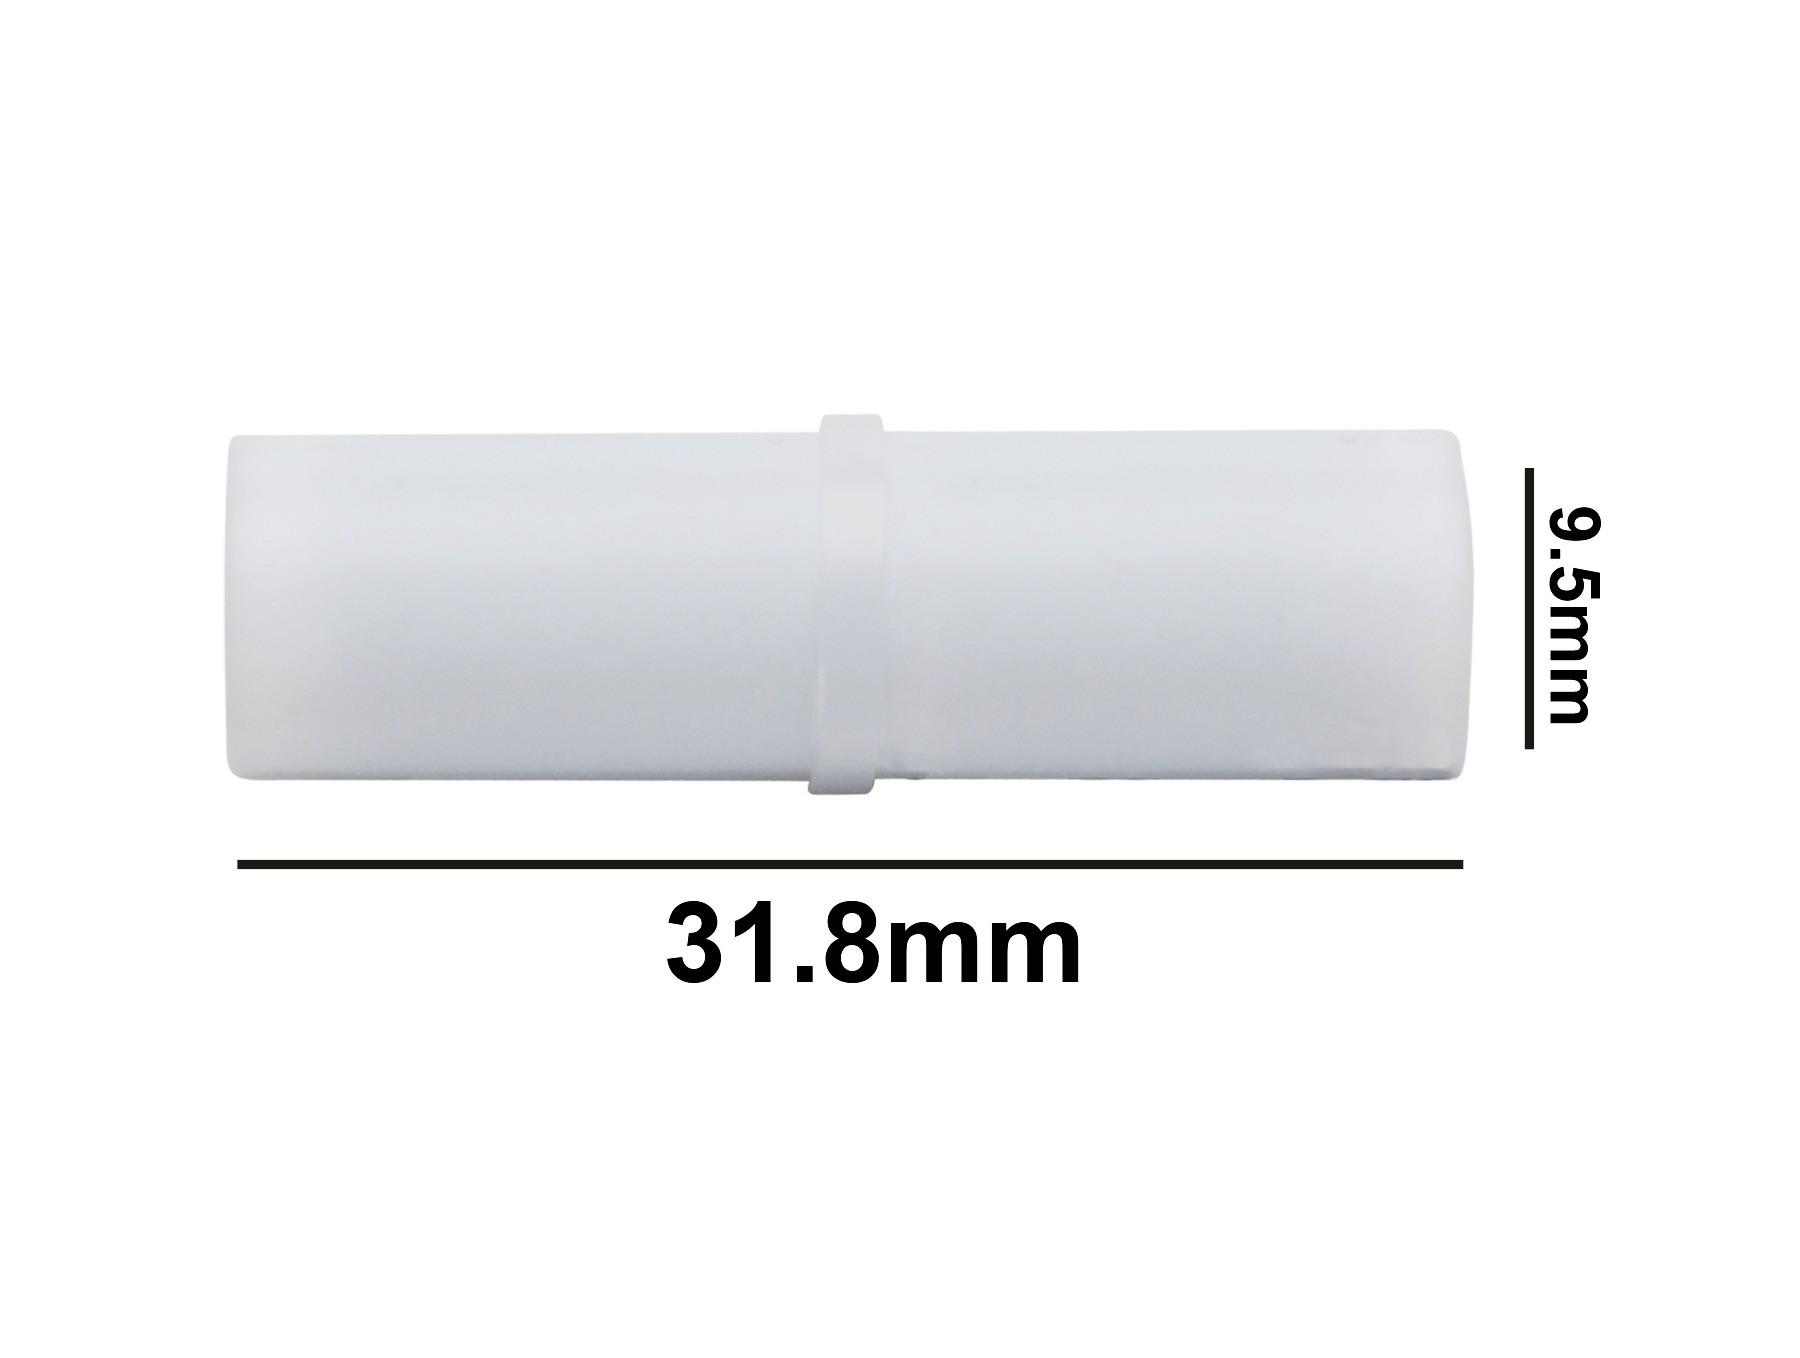 SP Bel-Art Spinbar Teflon Cylindrical Magnetic Stirring Bar; 31.8 x 9.5mm, White